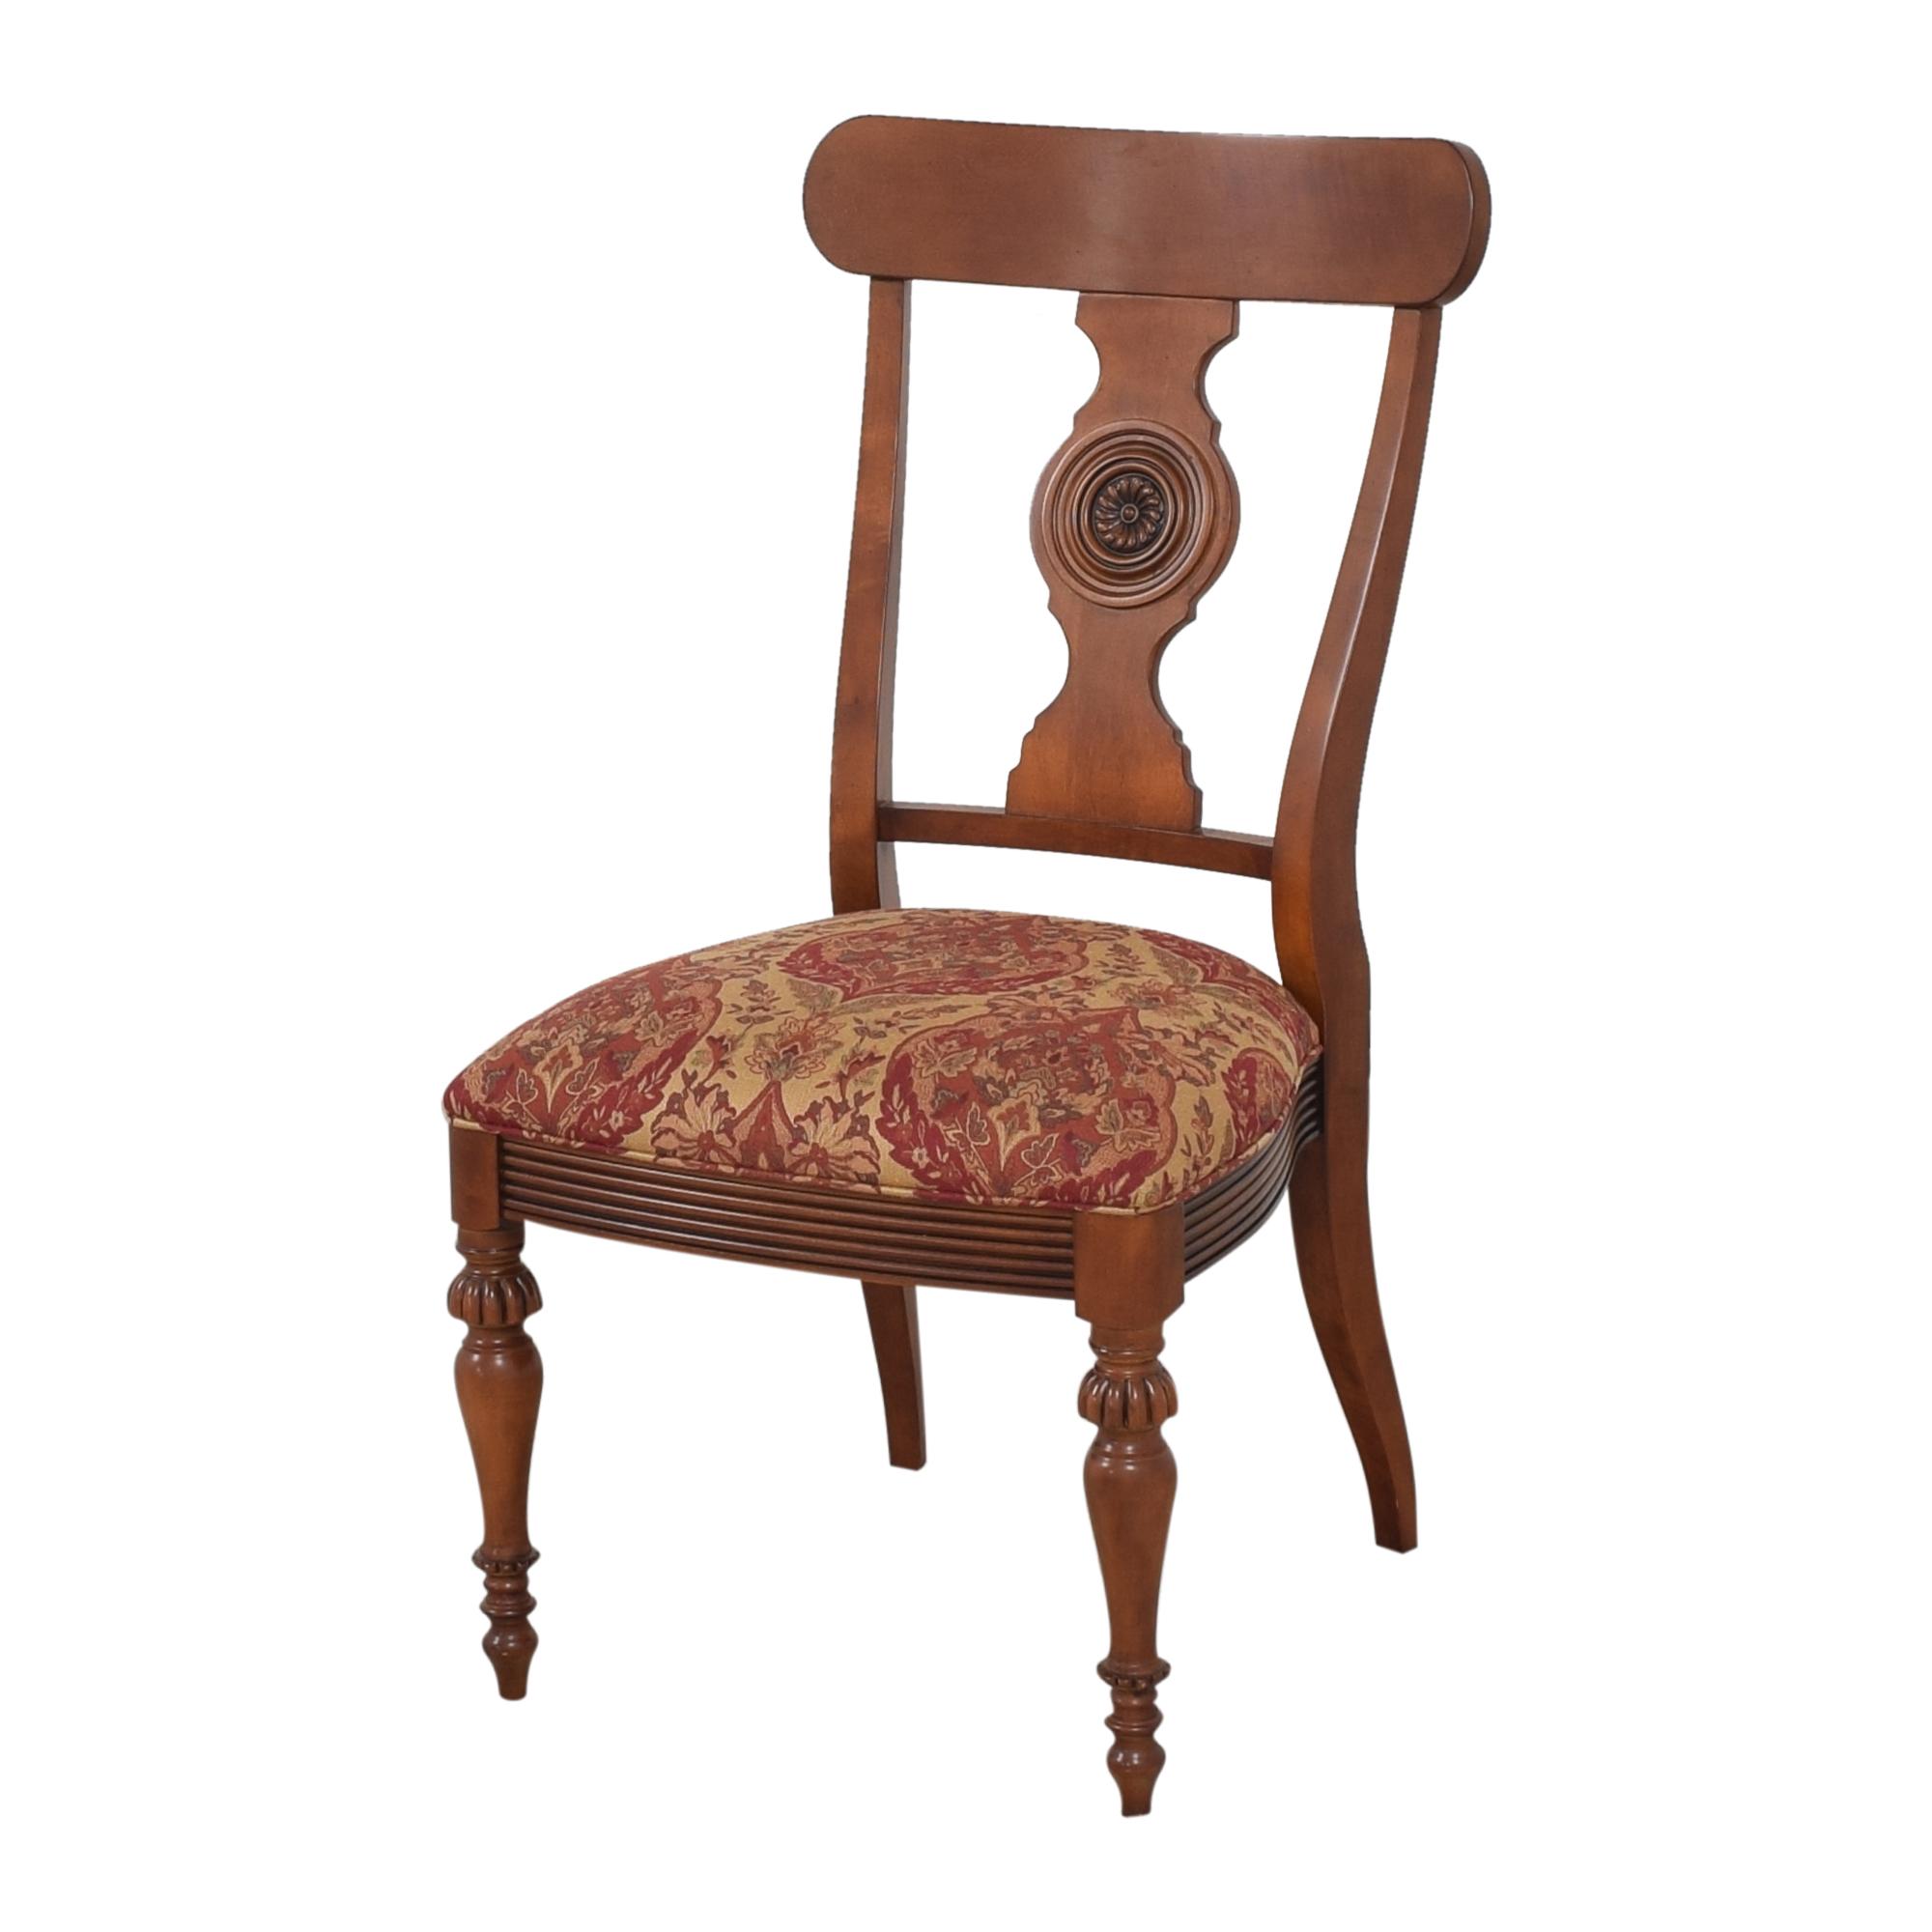 buy Ethan Allen Ethan Allen British Classic Splatback Dining Chairs online